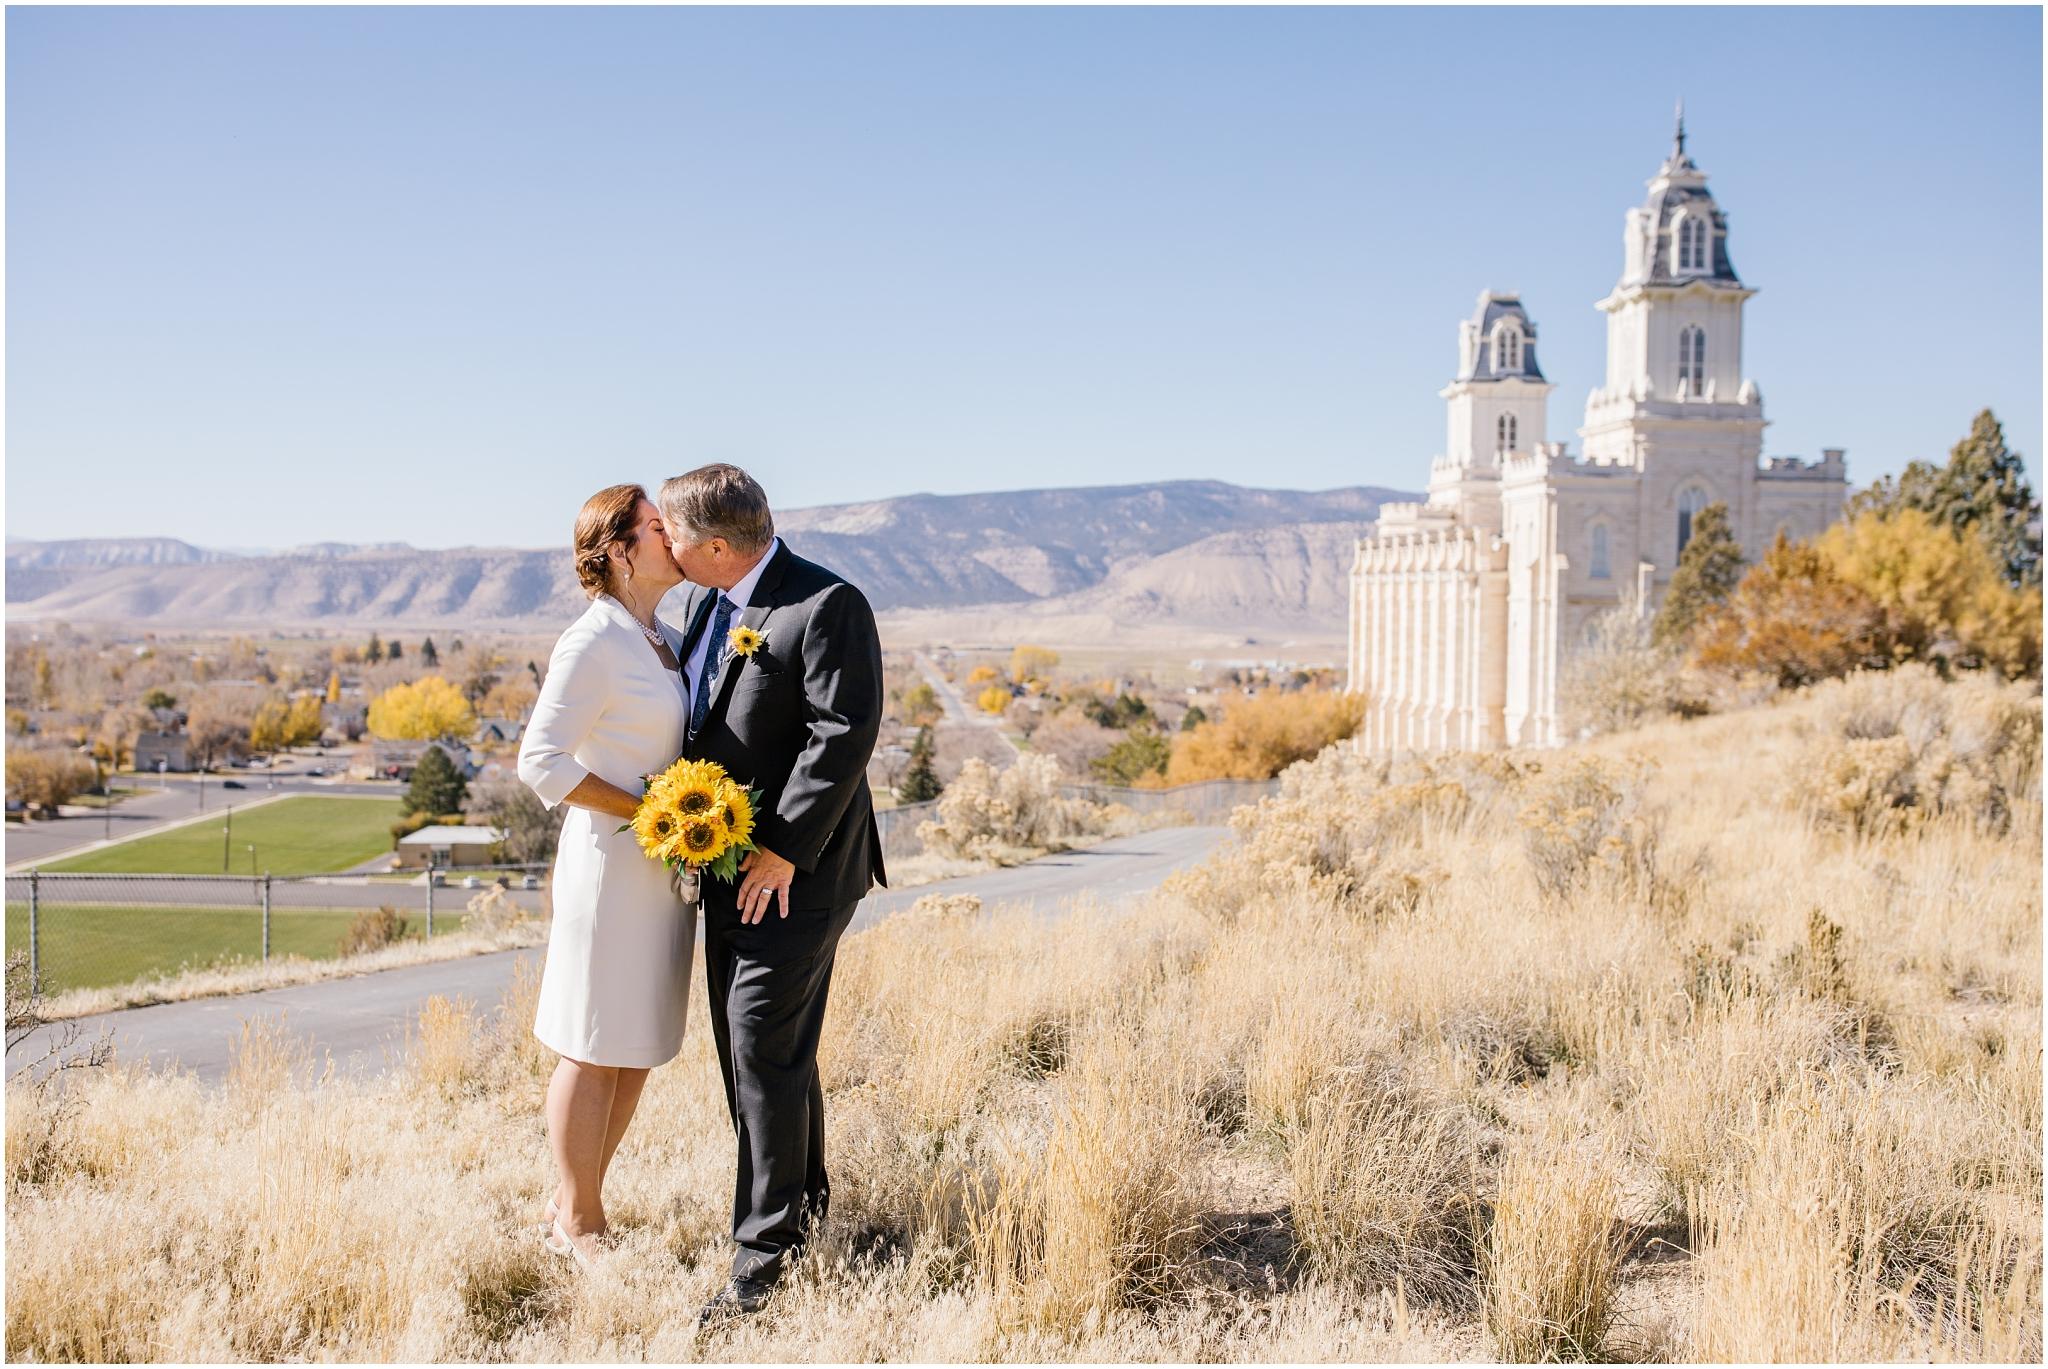 PDWeddingDay-82_Lizzie-B-Imagery-Utah-Wedding-Photographer-Salt-Lake-City-Park-City-Utah-County-Manti-Temple.jpg